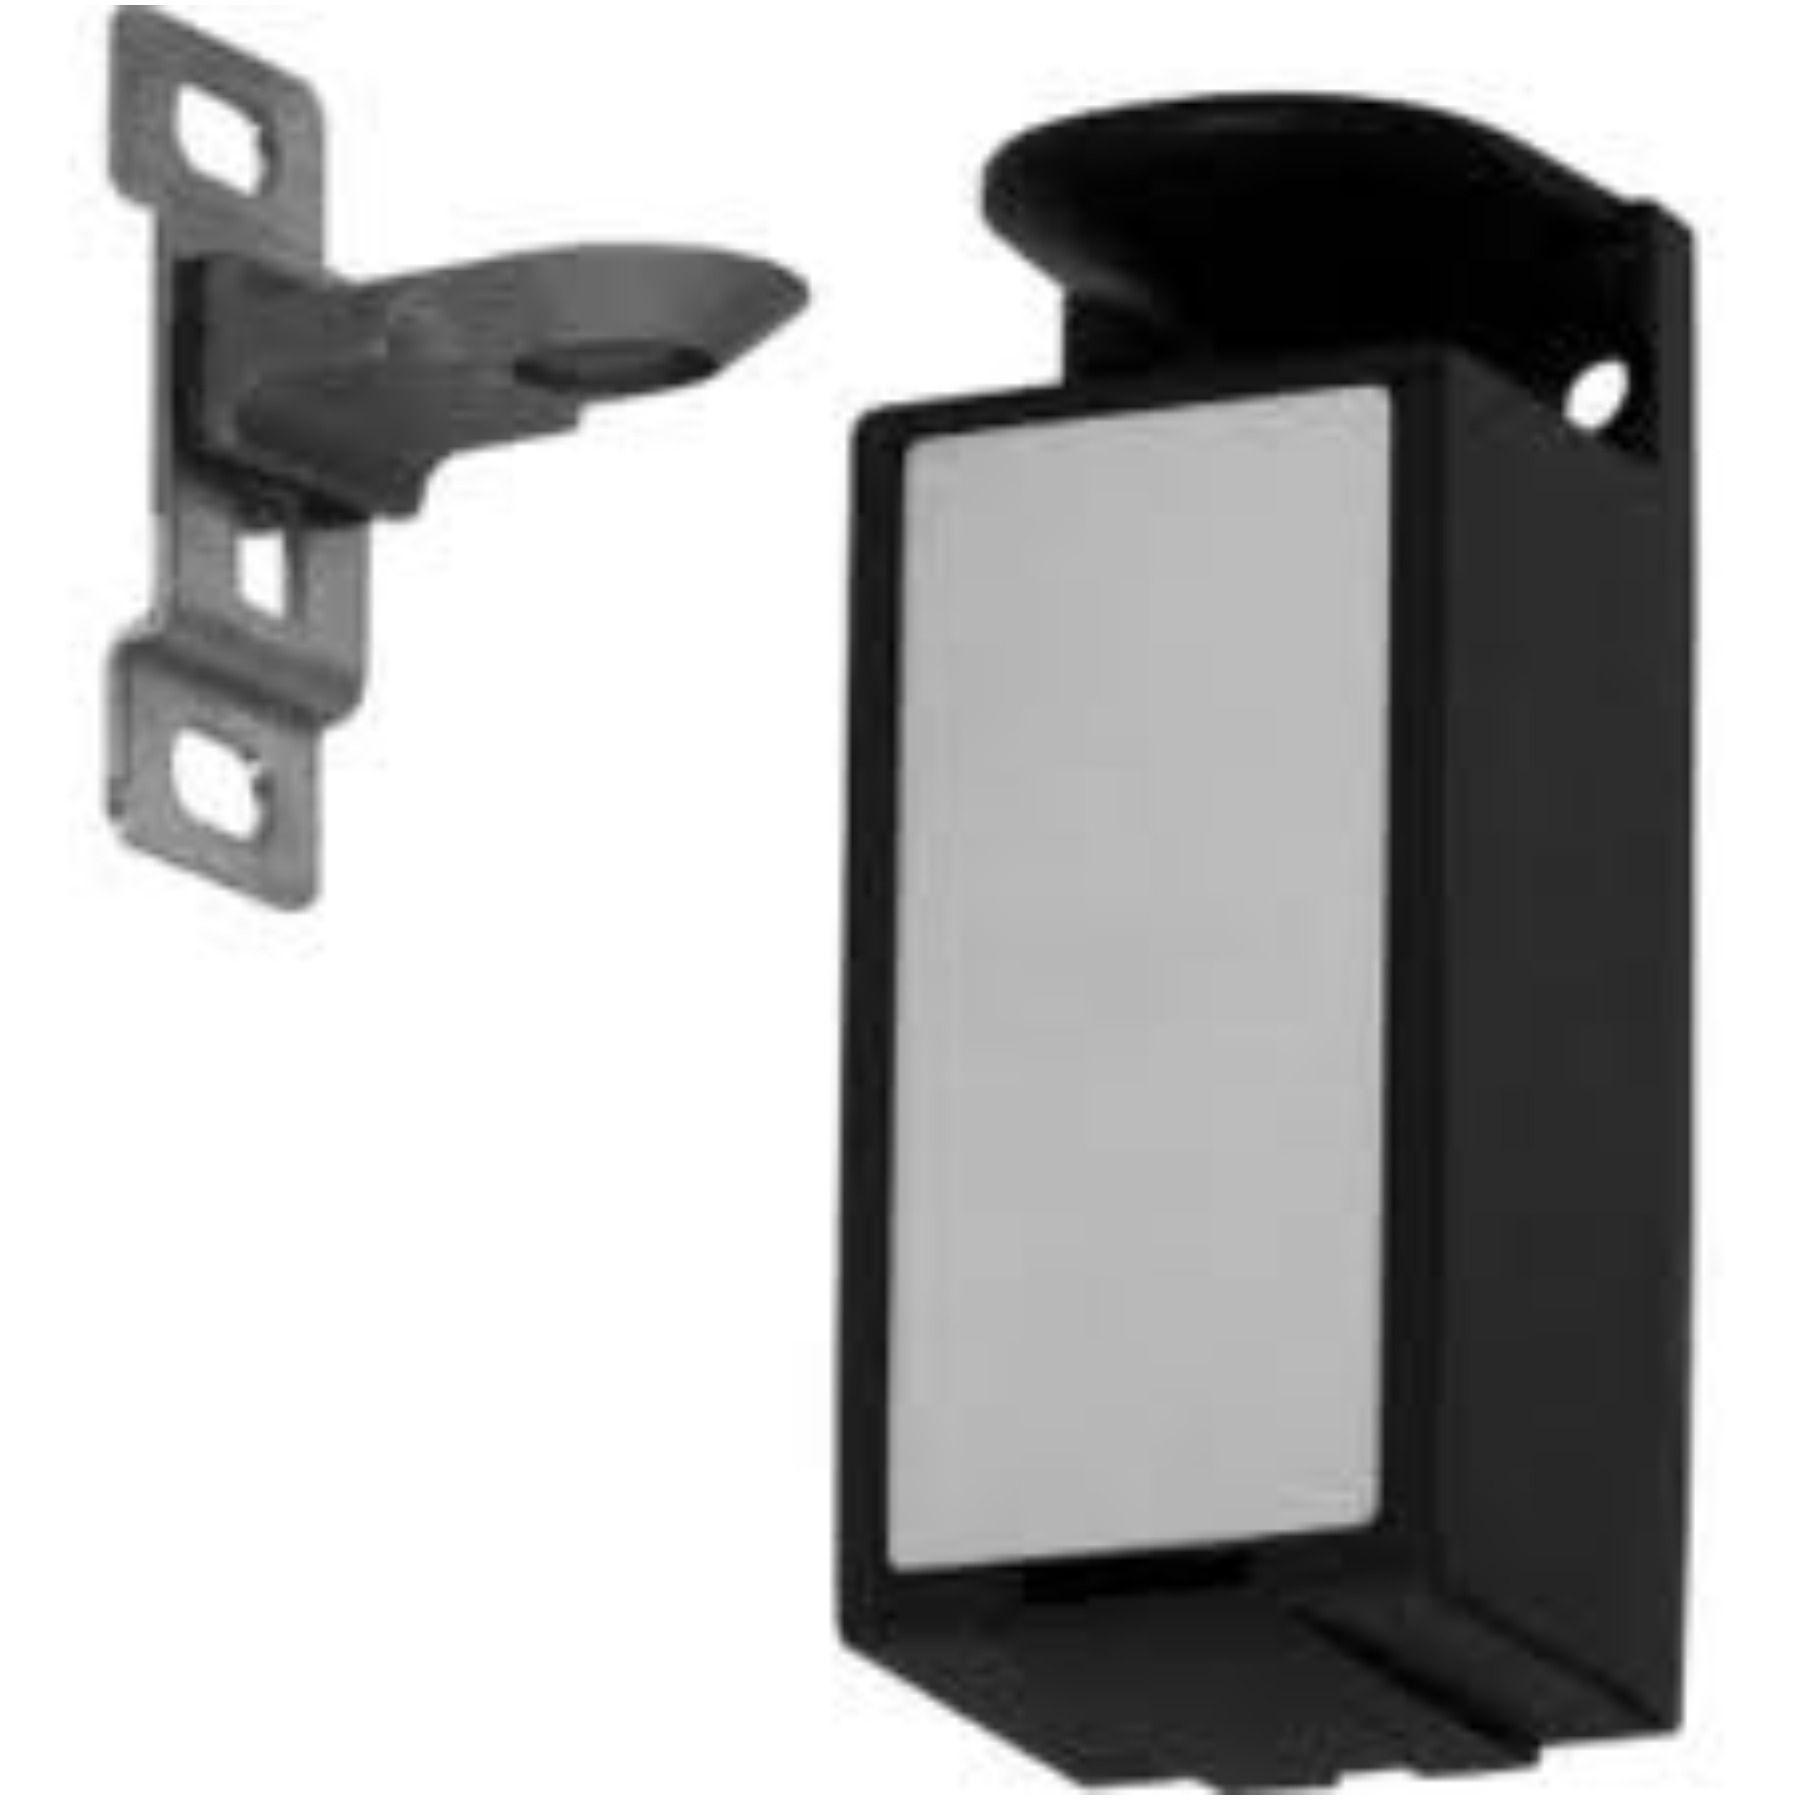 Sdc Security Door Controls 290 Micro Cabinet Lock  sc 1 st  Pinterest & Sdc Security Door Controls 290 Micro Cabinet Lock | http ...